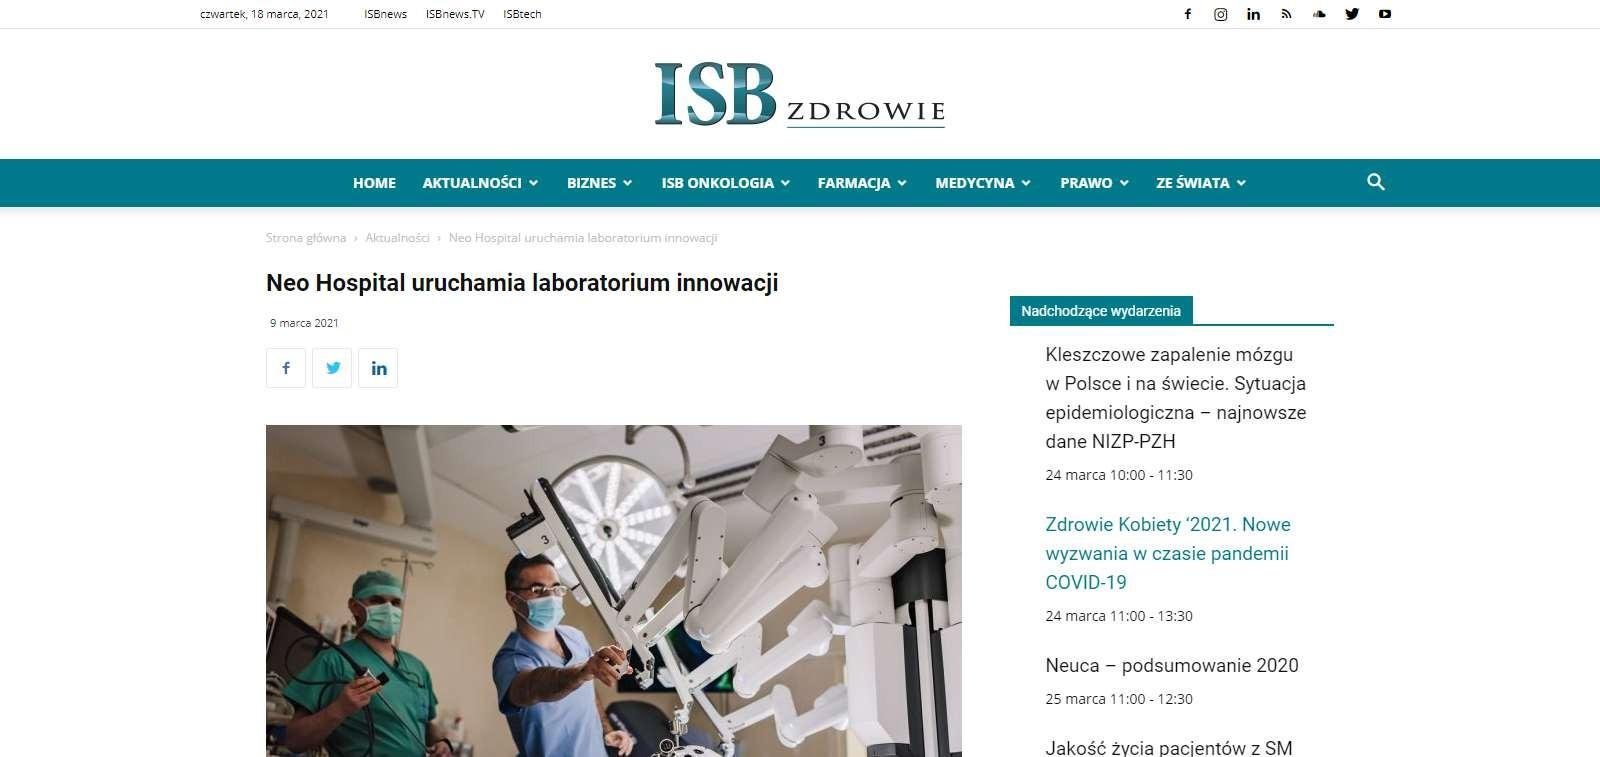 neo hospital uruchamia laboratorium innowacji